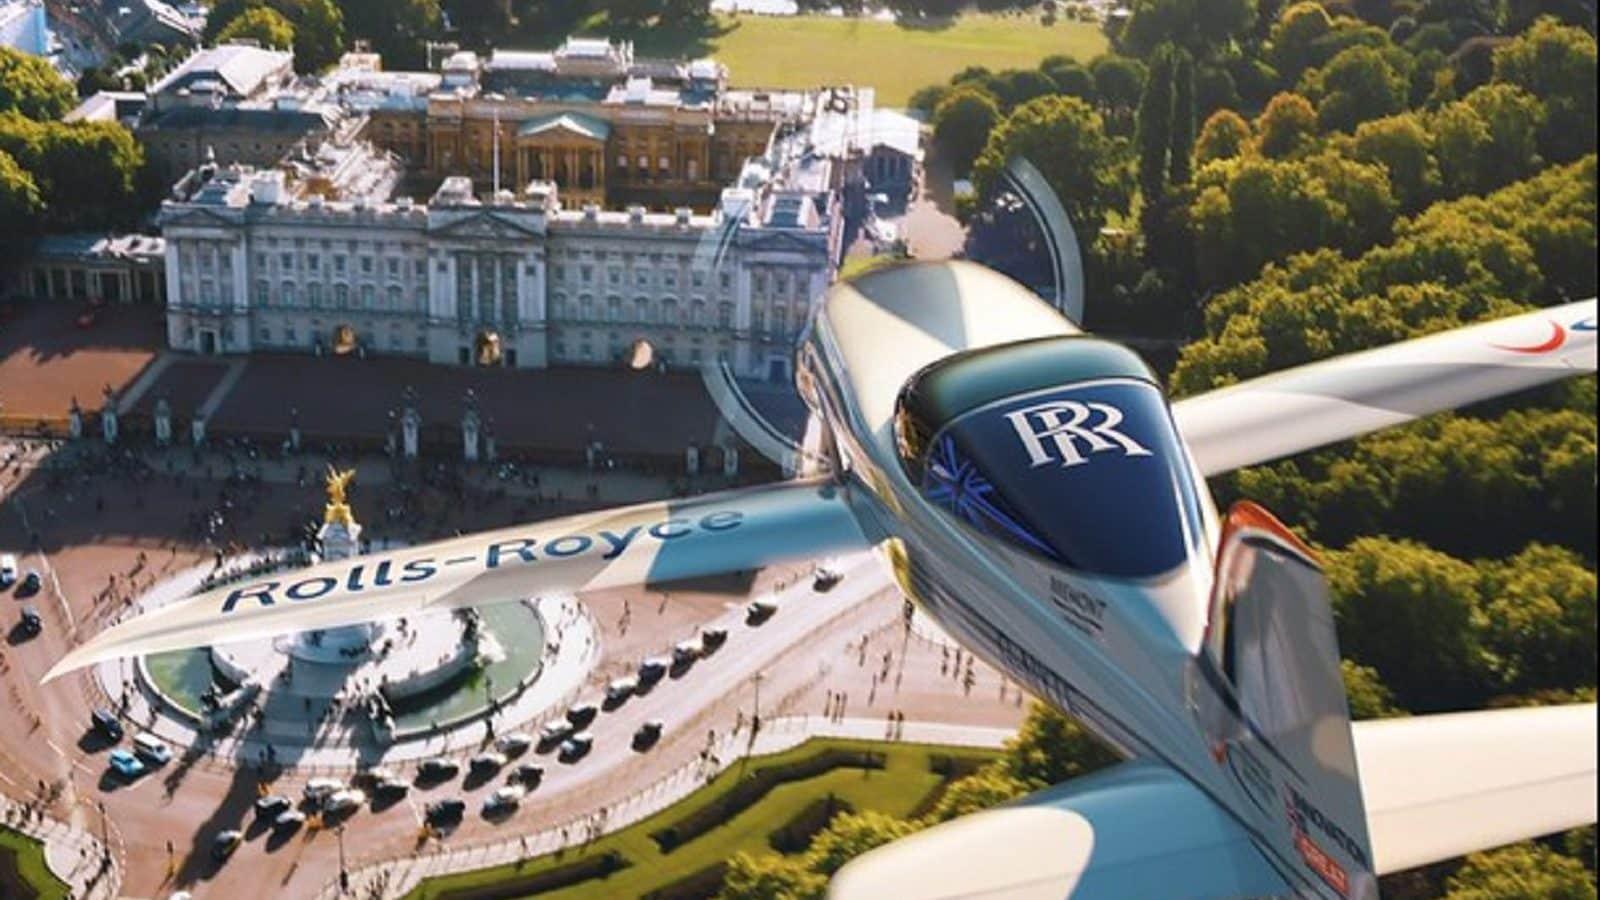 Rolls-Royce Electric Airplane